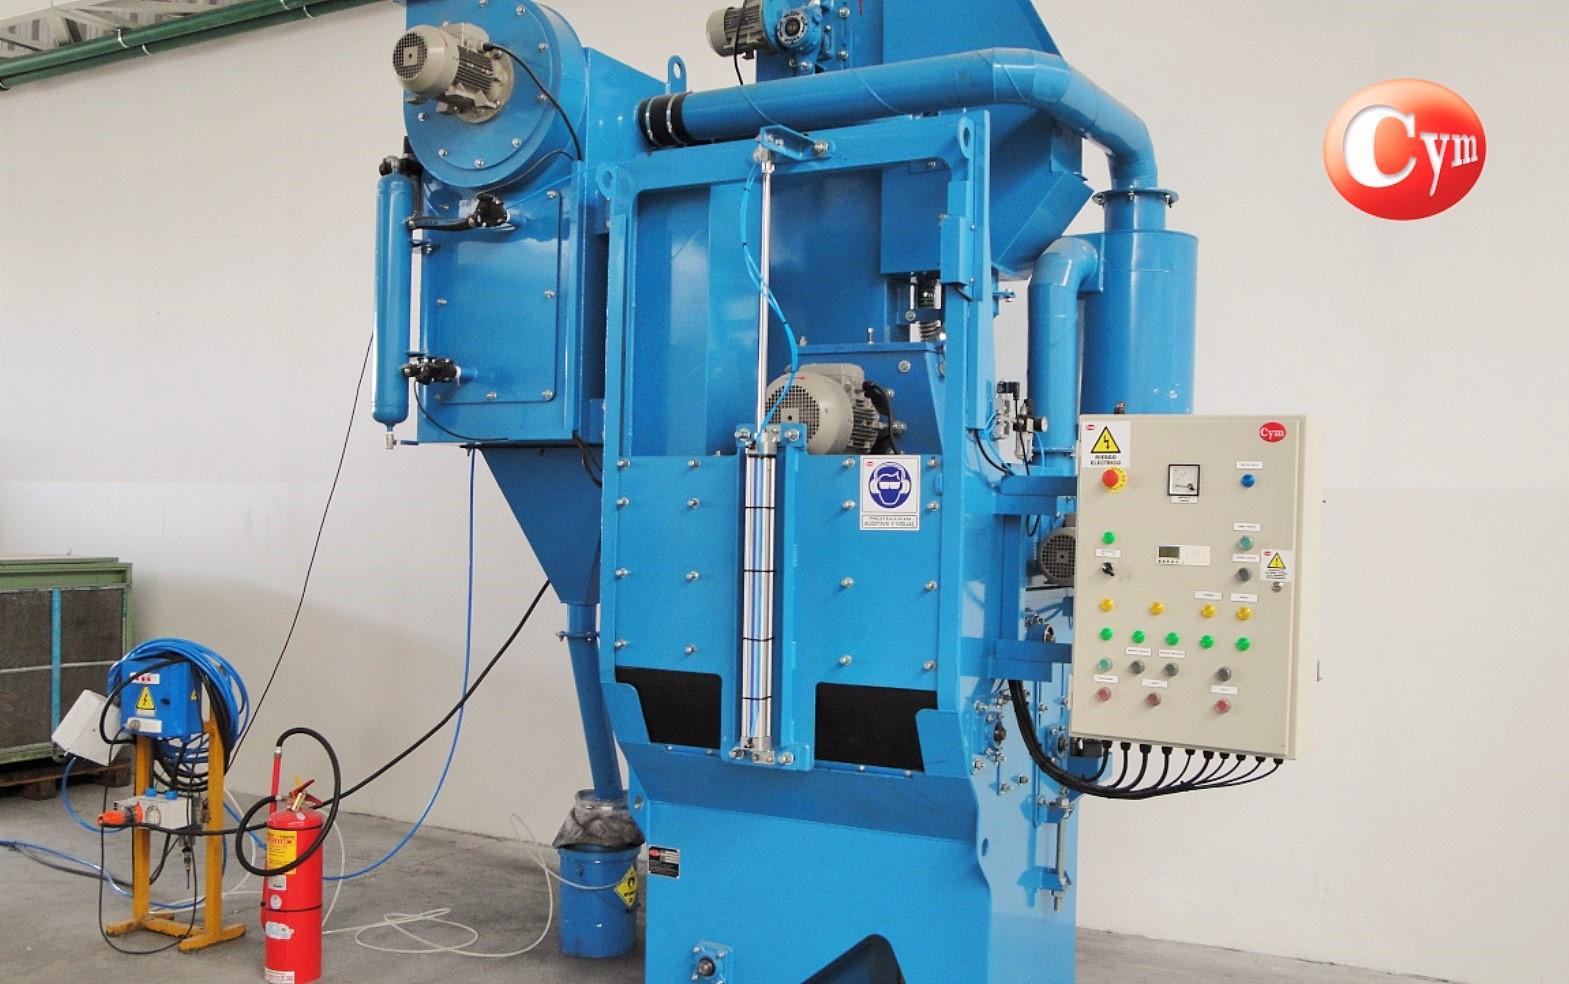 granalladora-de-cinta-rotativa-cym-lt60